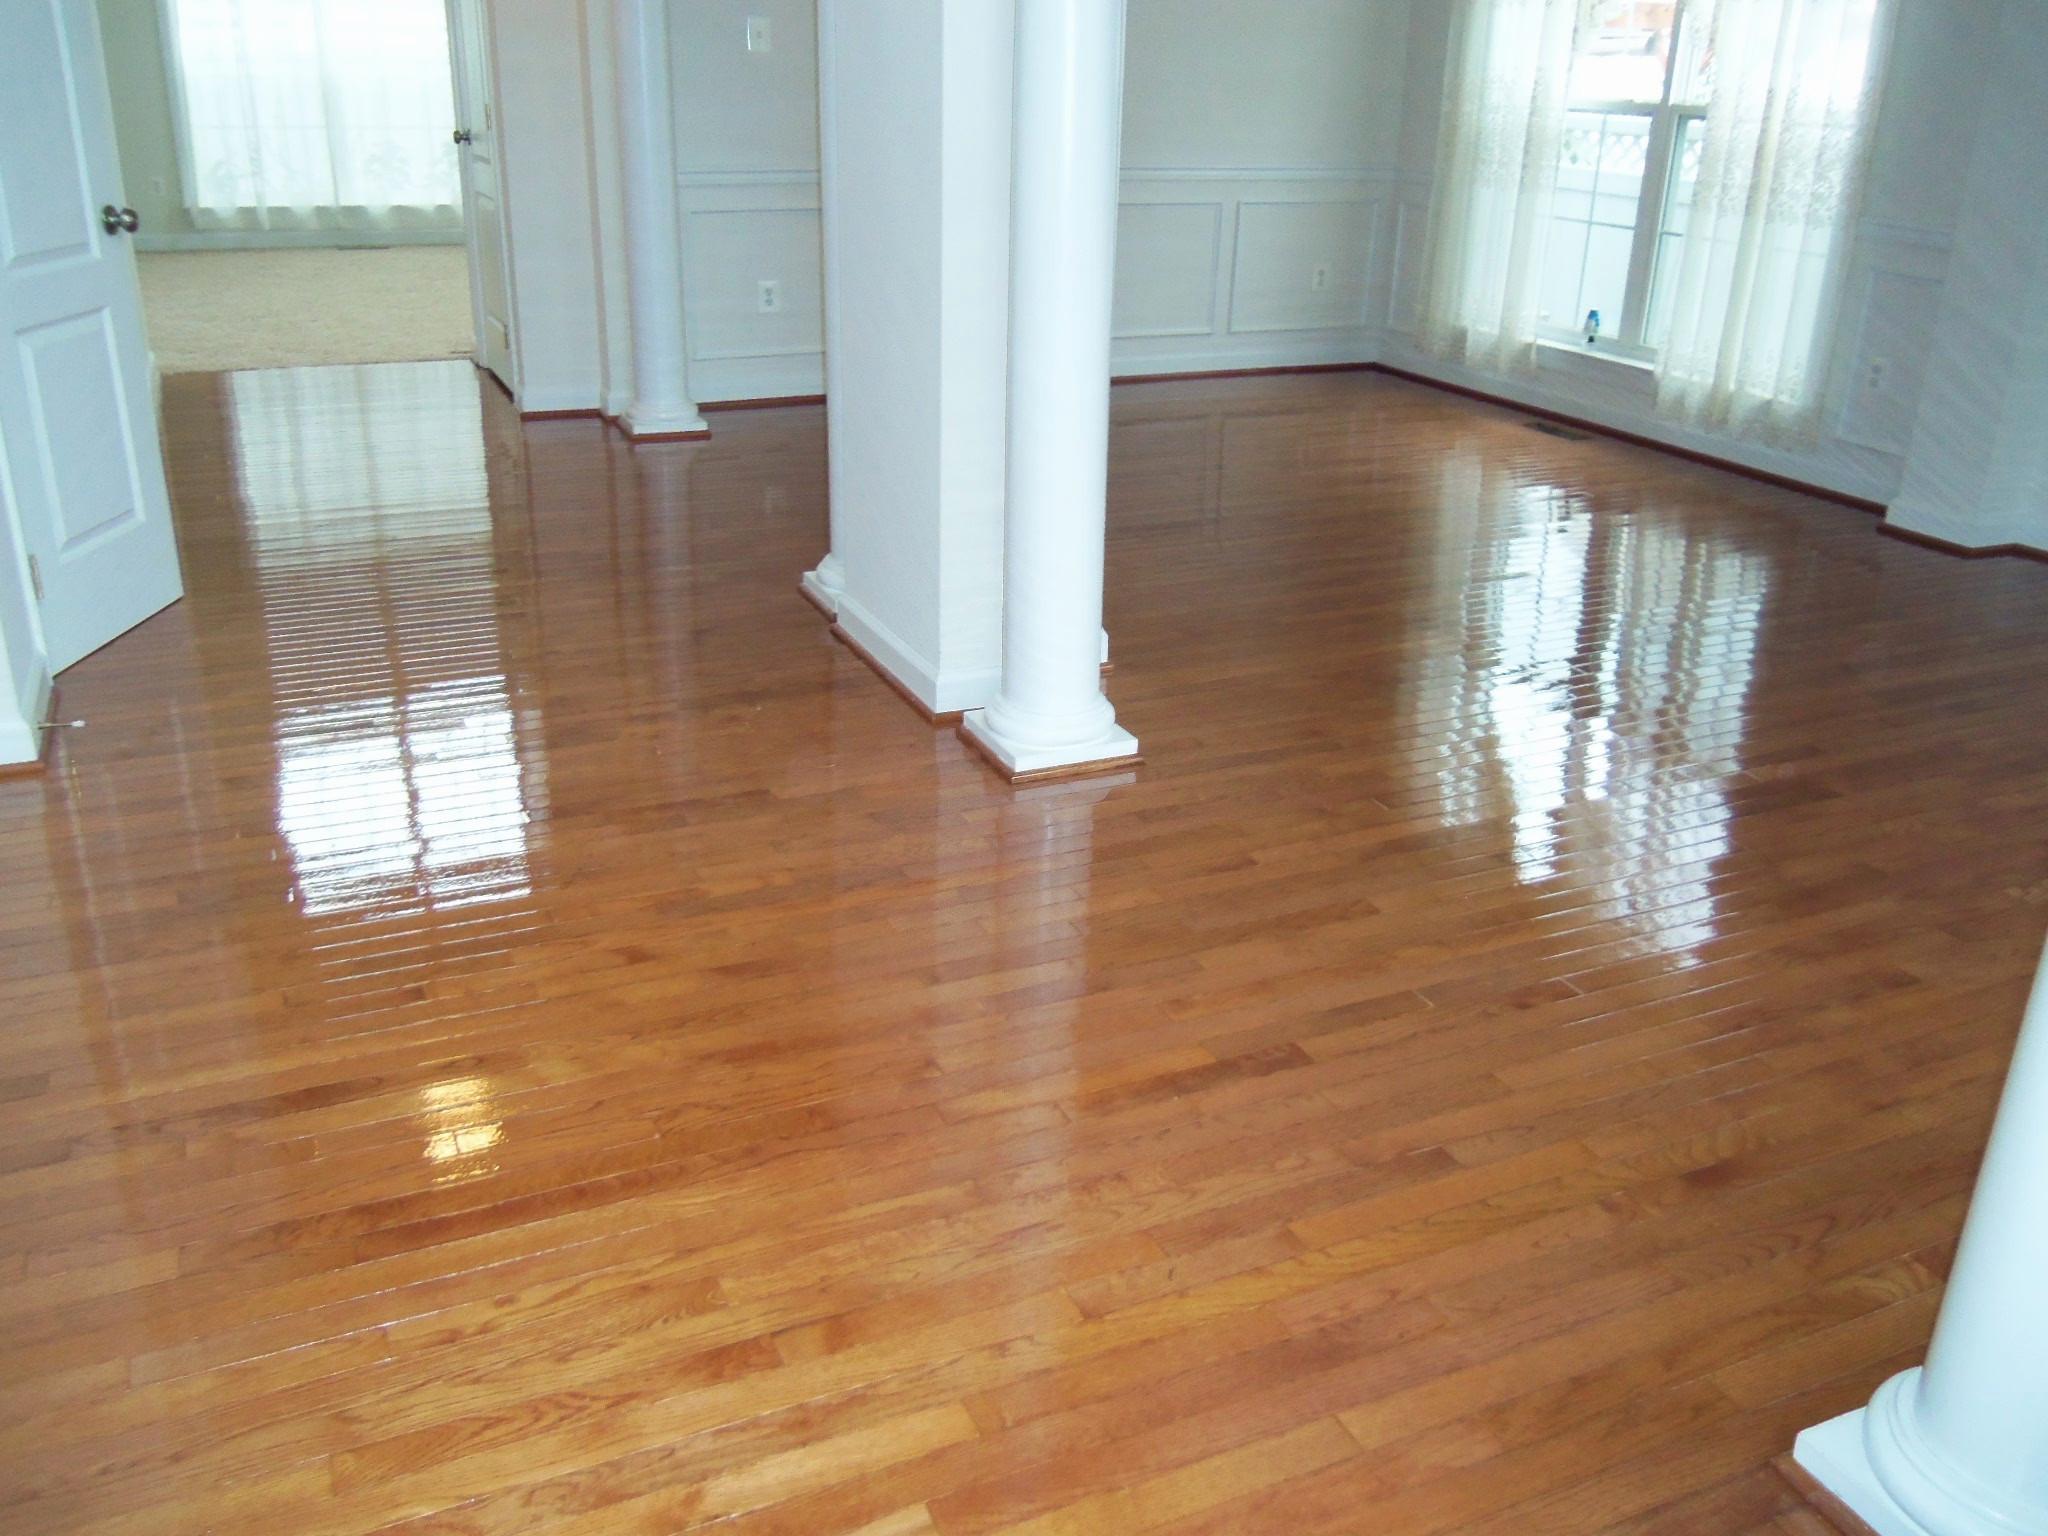 cost to install laminate hardwood floors of cost to install laminate flooring how to lay laminate flooring in e in cost to install laminate flooring 51 awesome how much does laminate flooring cost pics 51 s